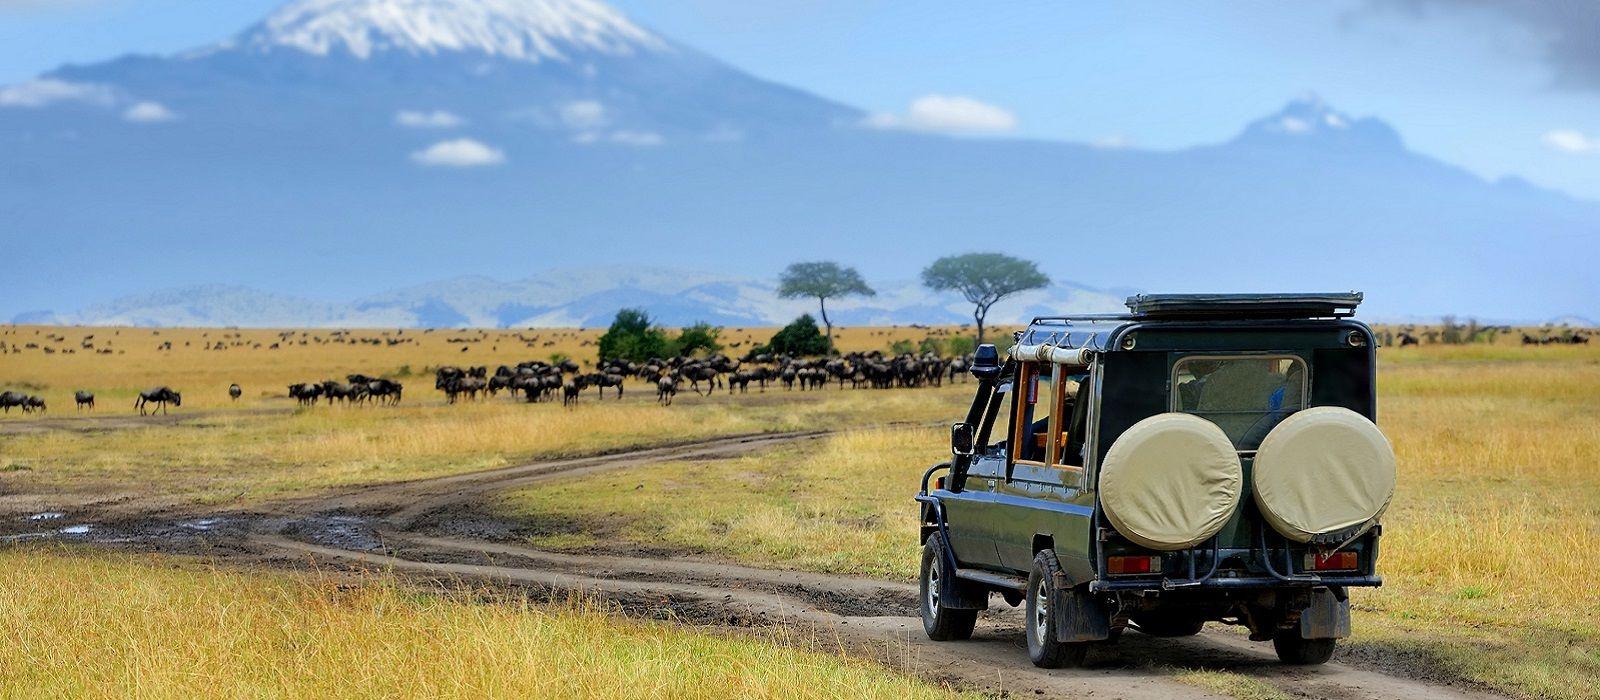 Atua Enkop Exklusiv: Kenia Safari und Strandurlaub Urlaub 1